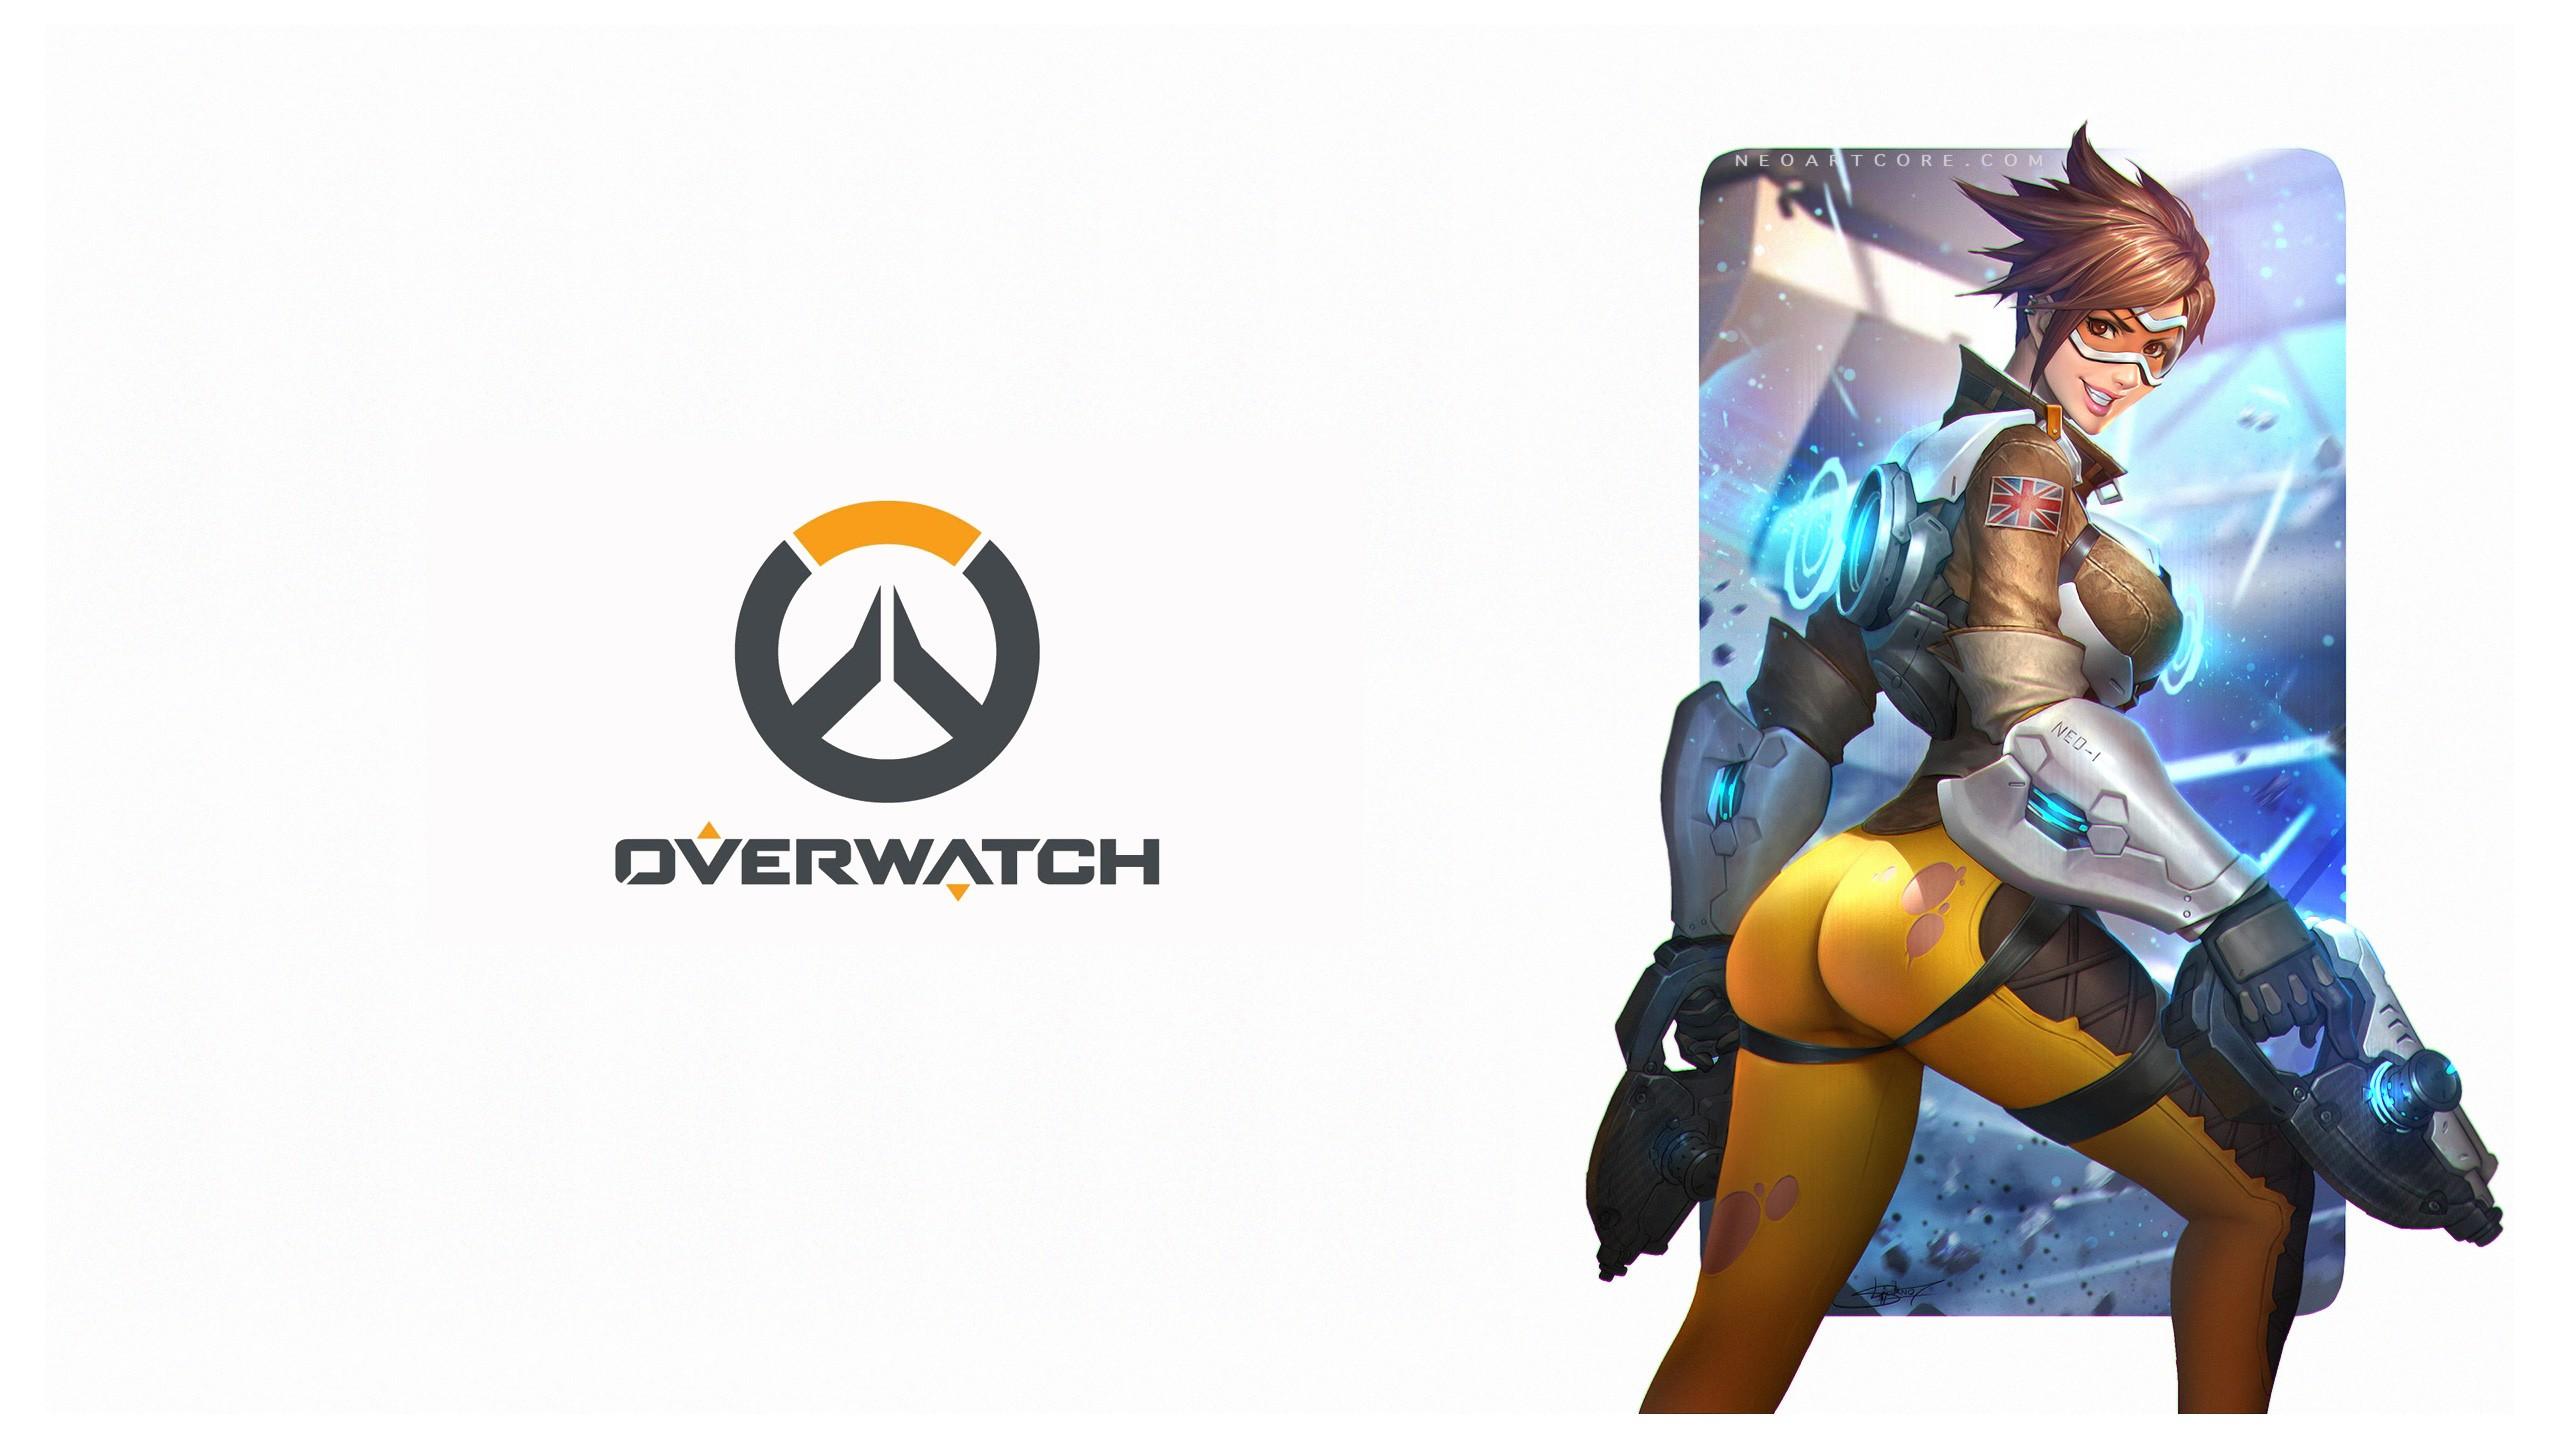 Overwatch tracer sex